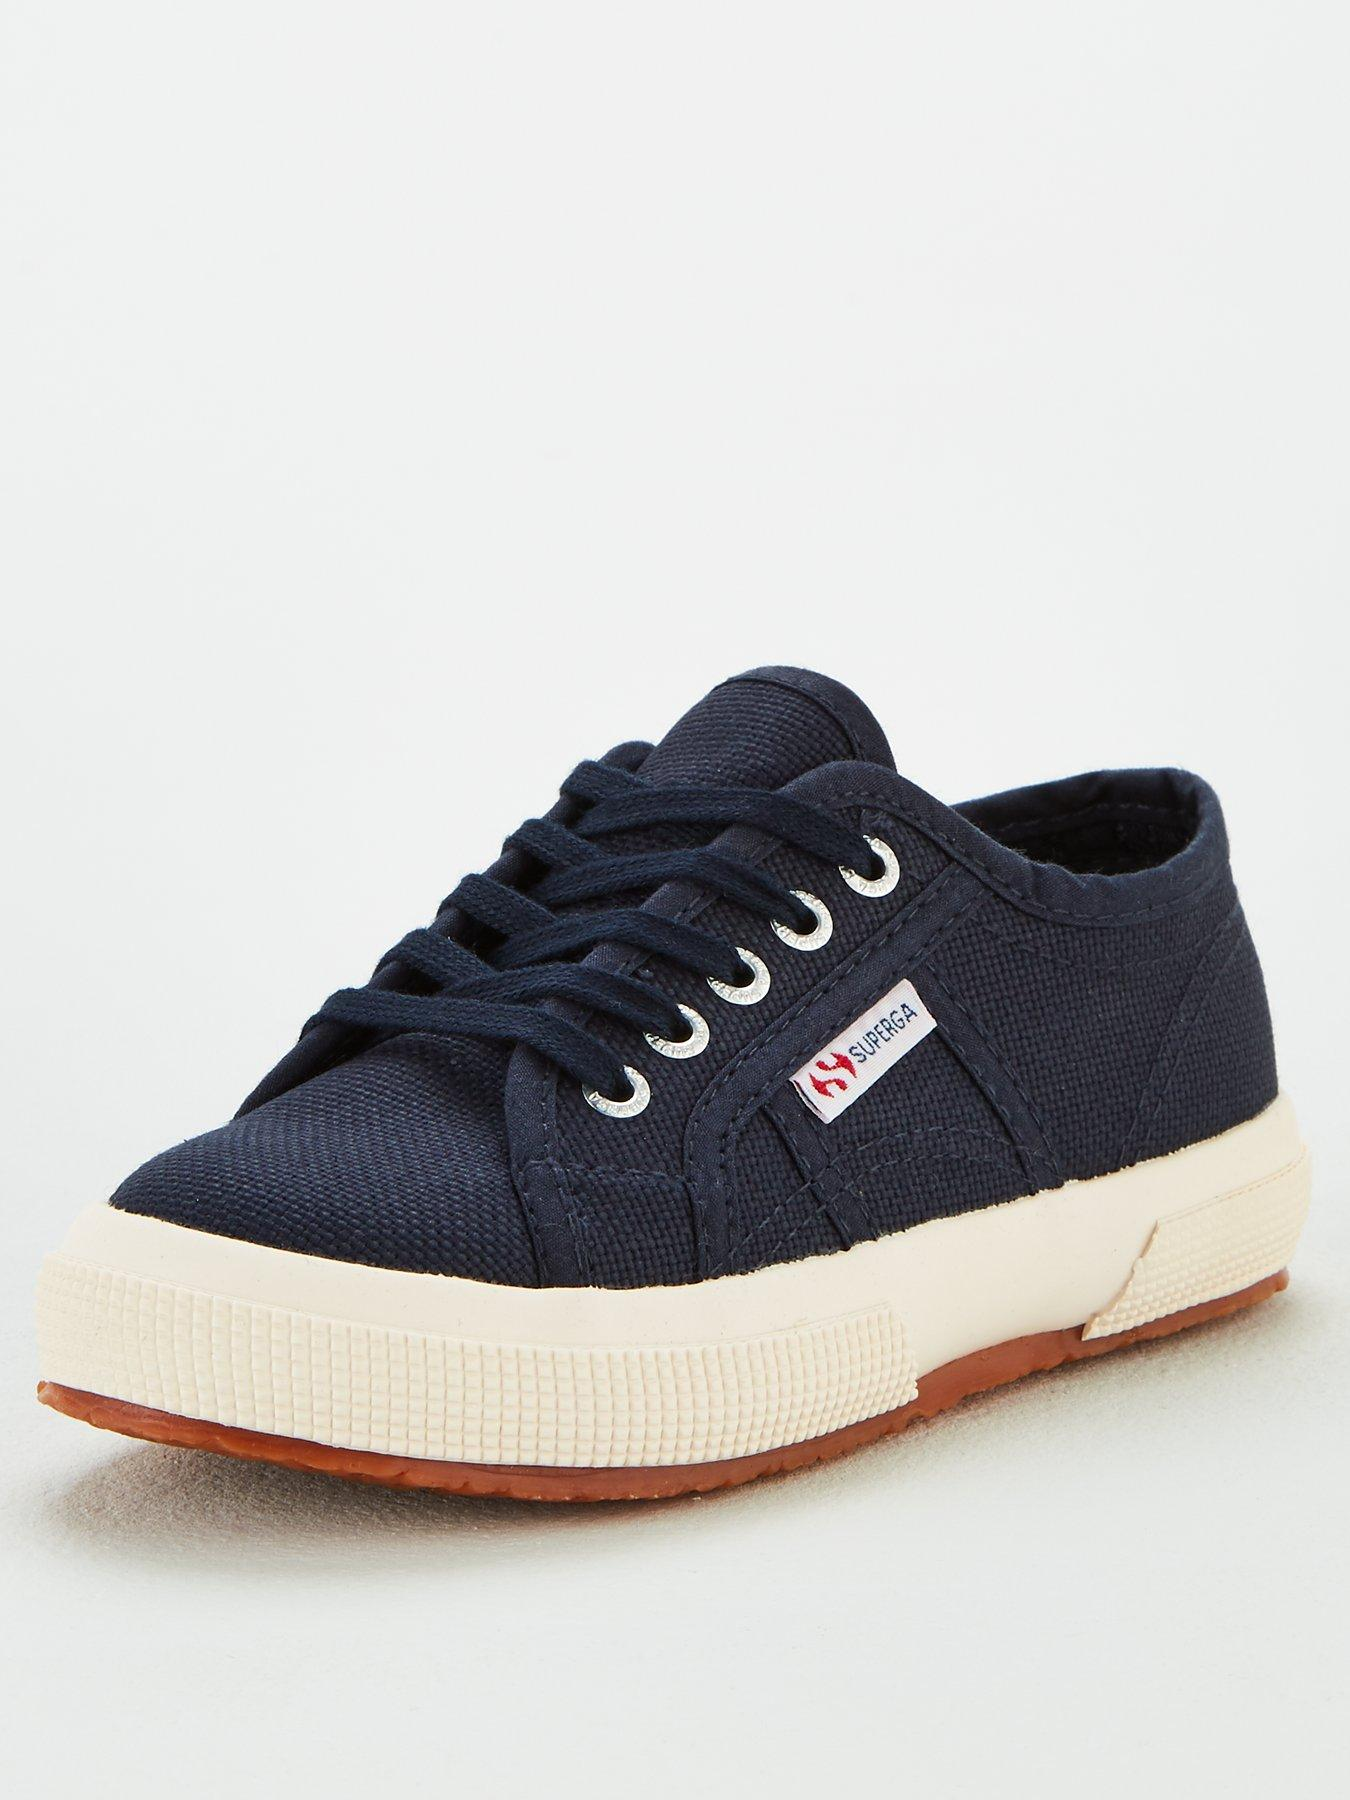 Superga Unisex Kids 2750 Lameb Low-Top Sneakers